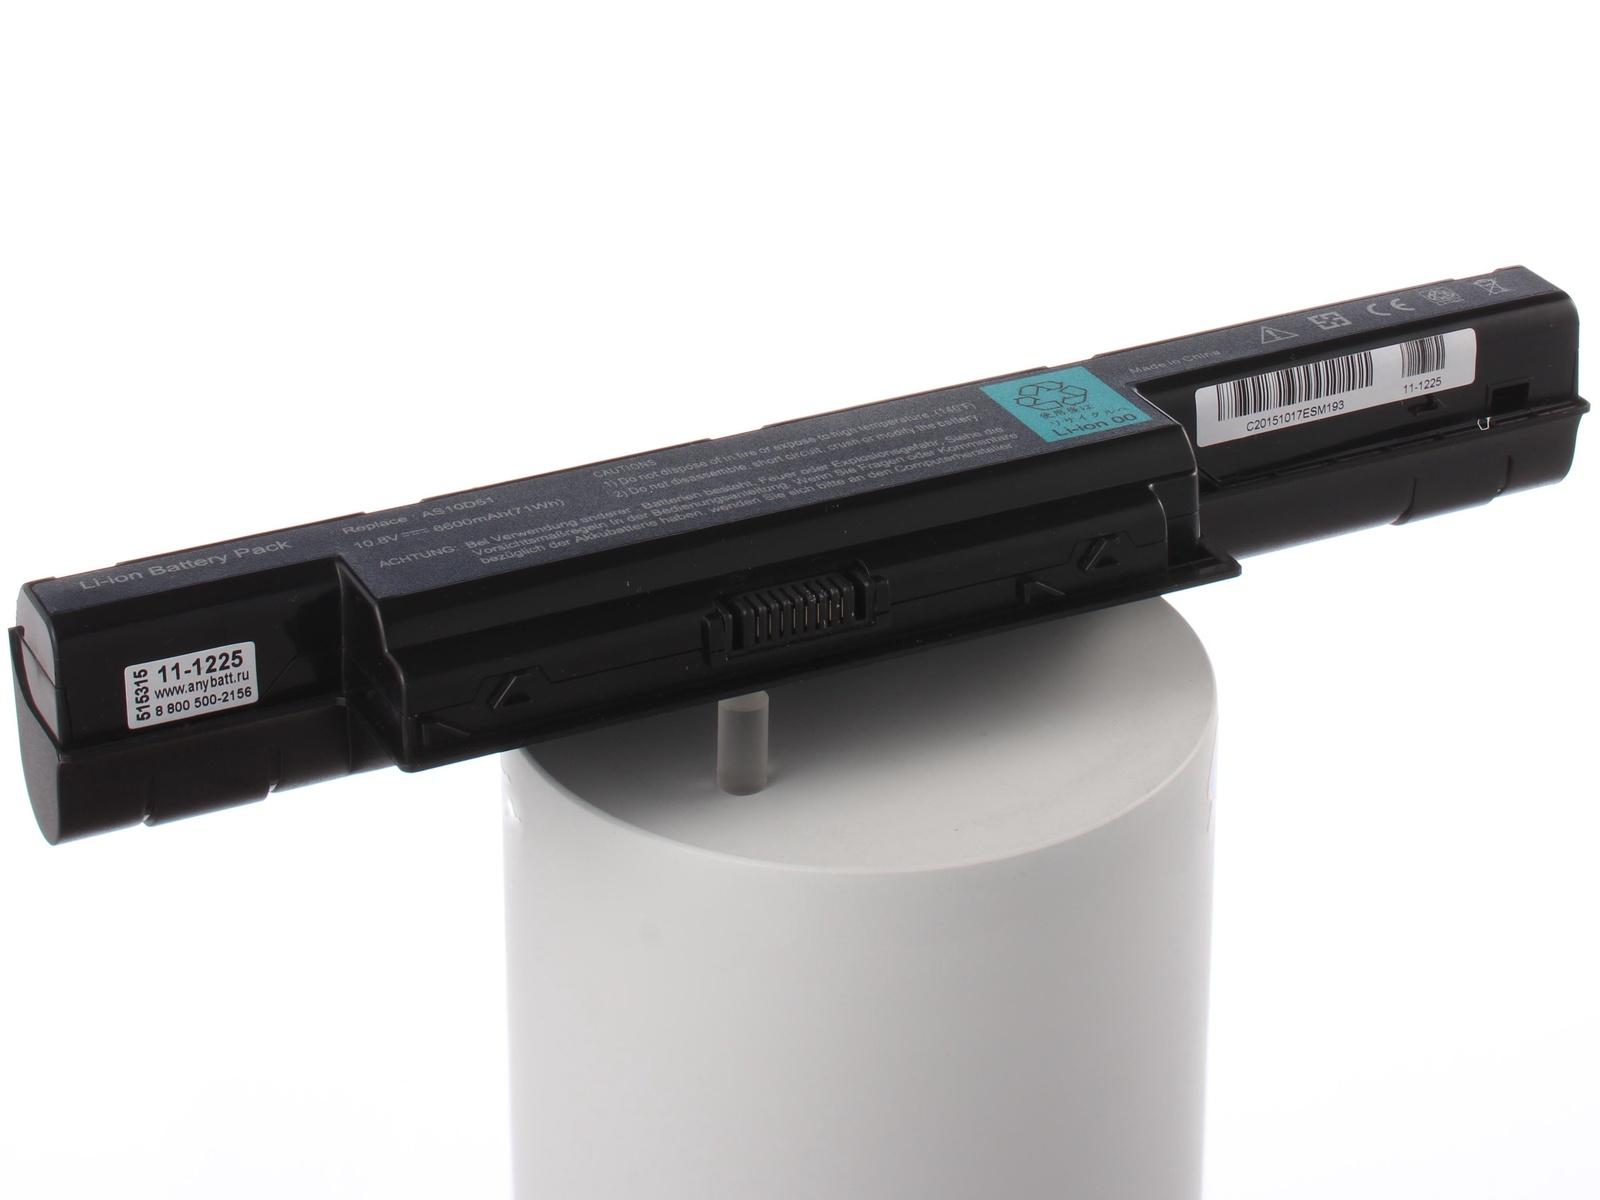 Фото - Аккумулятор для ноутбука AnyBatt для Acer Aspire V3-772G-747a8G1TMamm, Aspire 5349-B812G32Mnkk, TravelMate 5760Z, TravelMate 5740G, Aspire 5741G-434G32Misk, Aspire 5742G-373G25Mikk, Aspire 5750G-2434G64Mnkk аккумуляторная батарея topon top ac5551 4400мач для ноутбуков acer aspire 4551g 4741 4771g 5253 5333 5551 5741g 5750g 7551g 7741g v3 travelmate 4750 5740g 7750g 8572tg e640 e642g